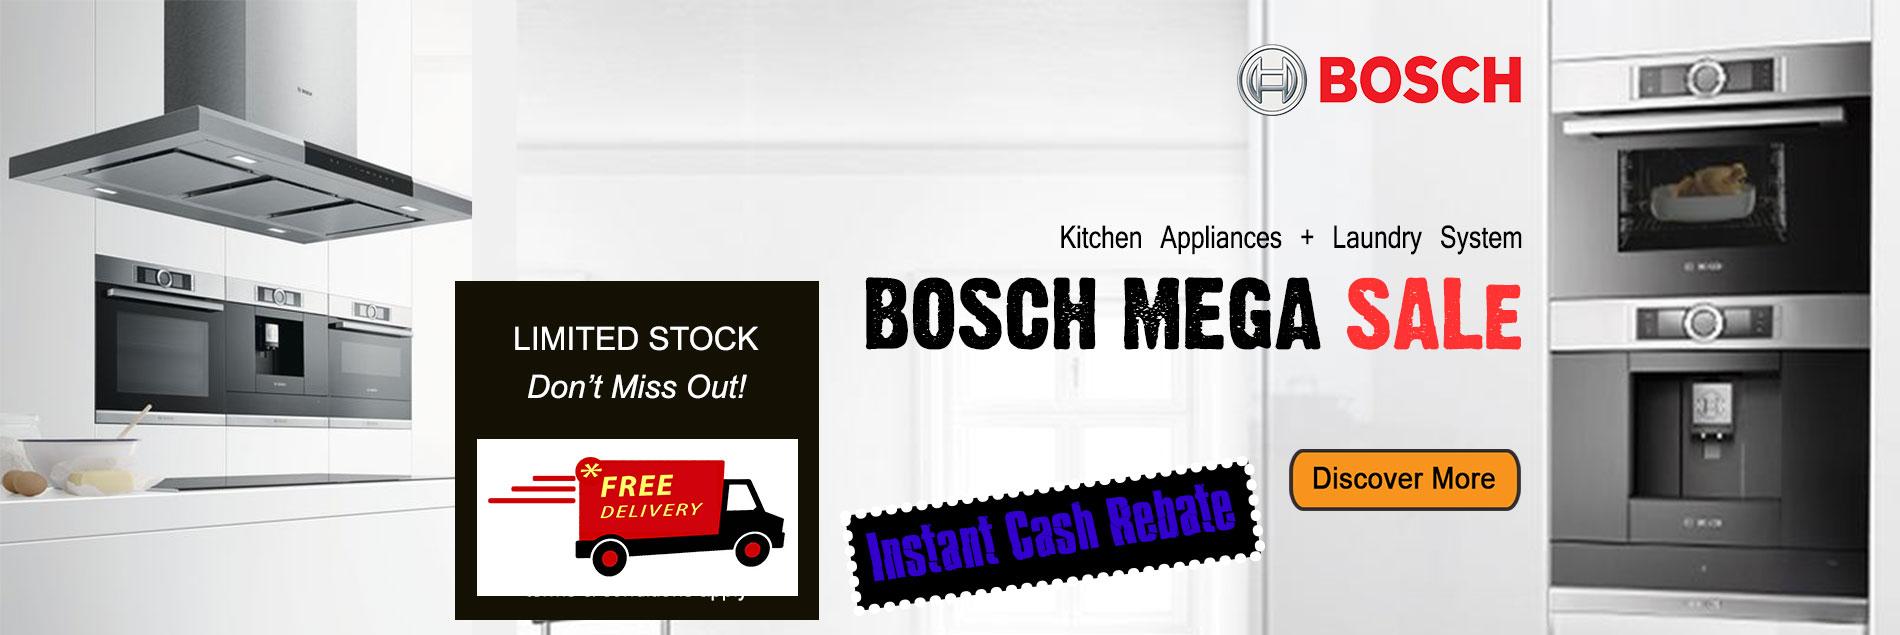 Bosch Mega Stock Clearance